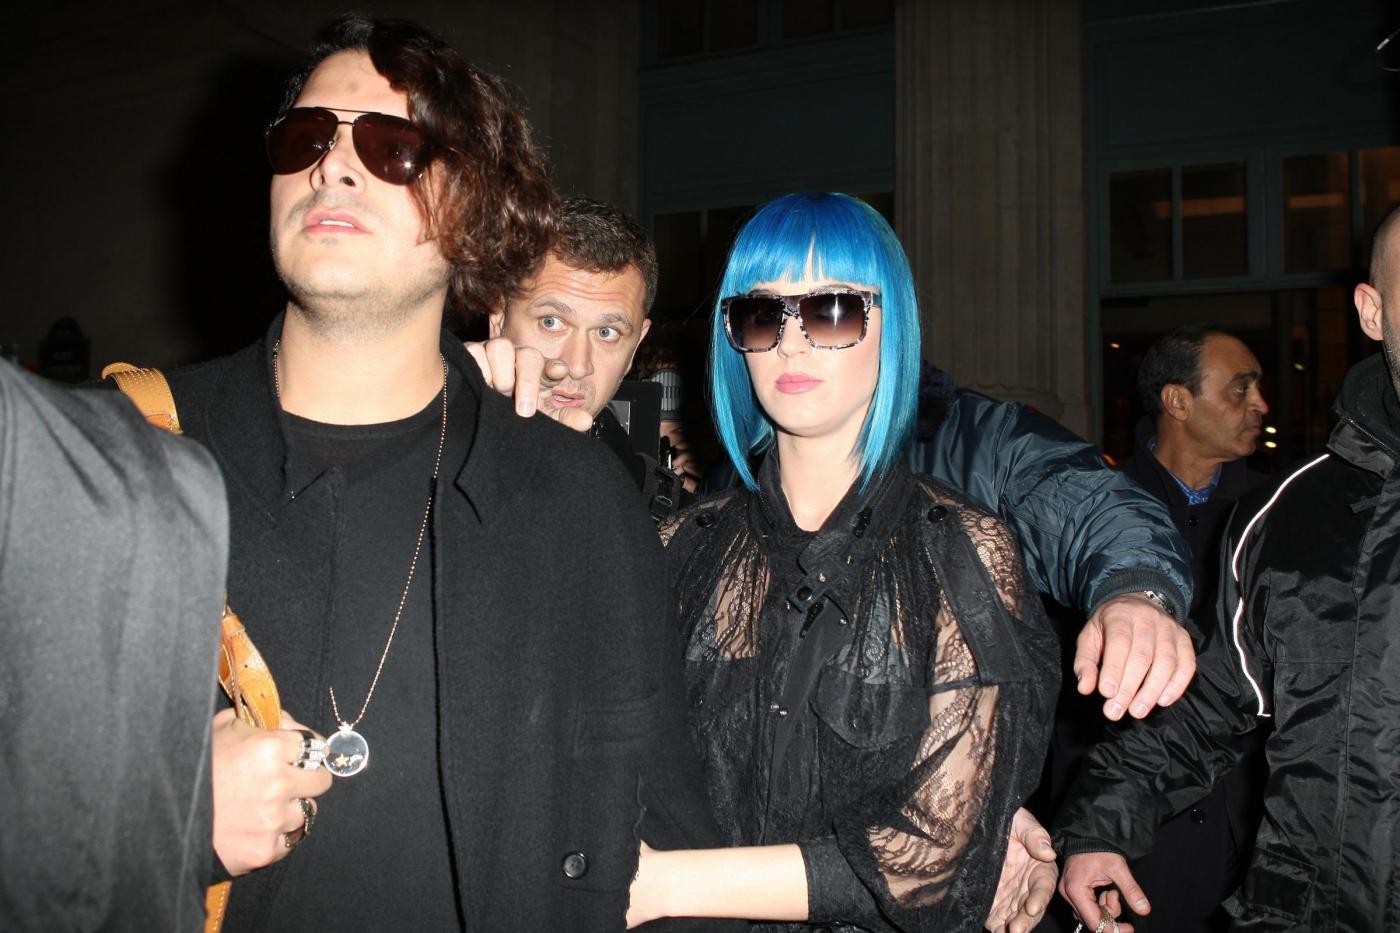 Katy Perry e Baptiste Giabiconi a Parigi 06